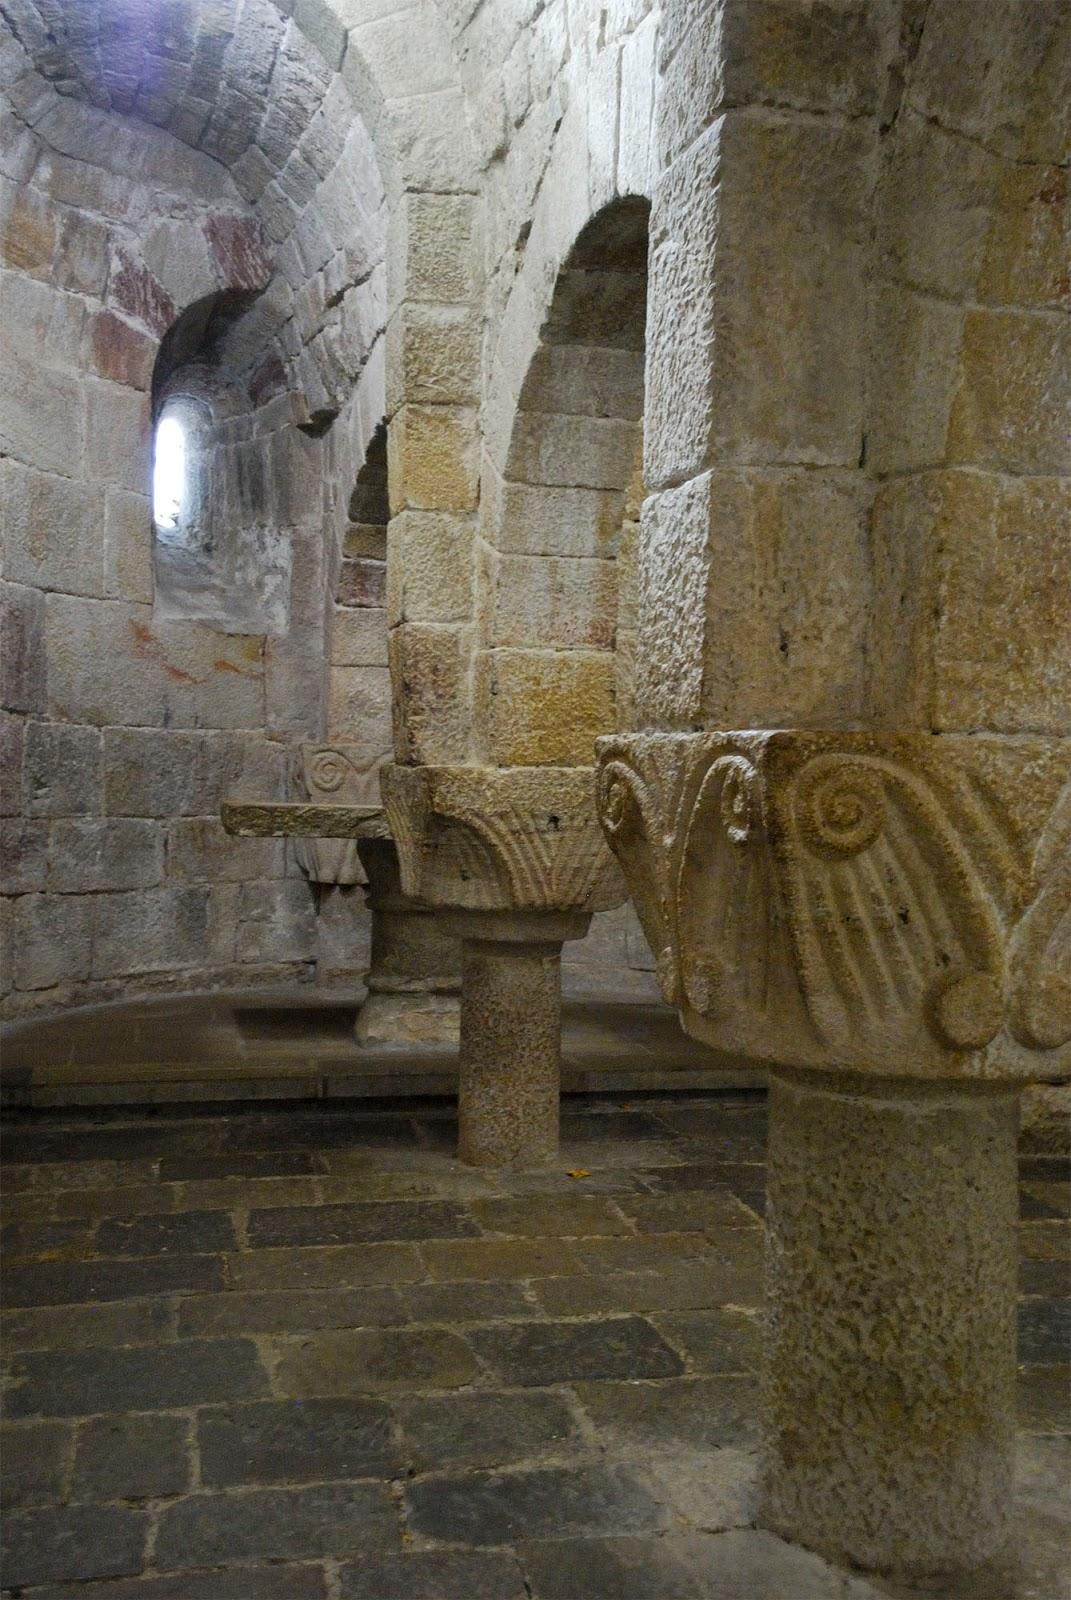 monasterio leyre navarra spain chapel capilla